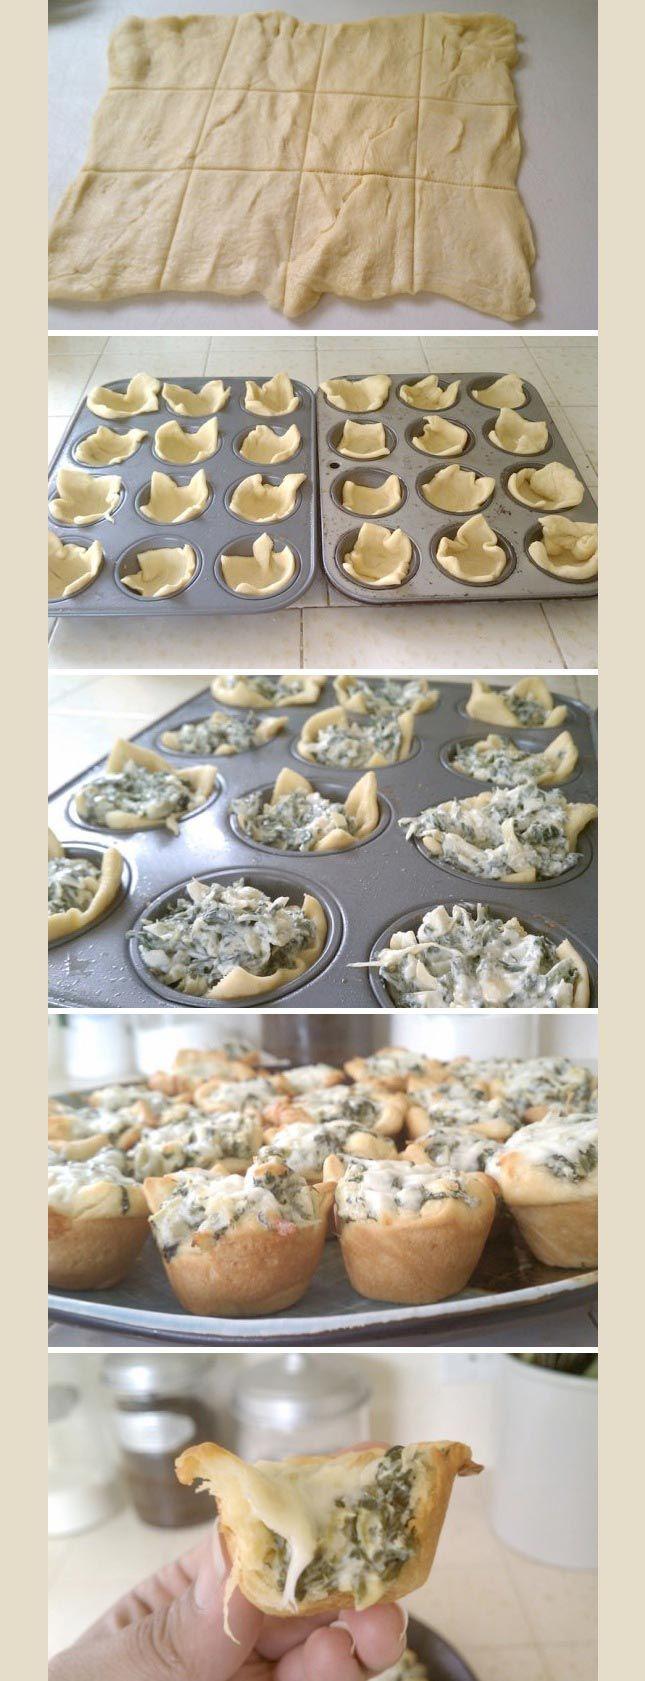 techlovedesign: Spinach Artichoke Bites